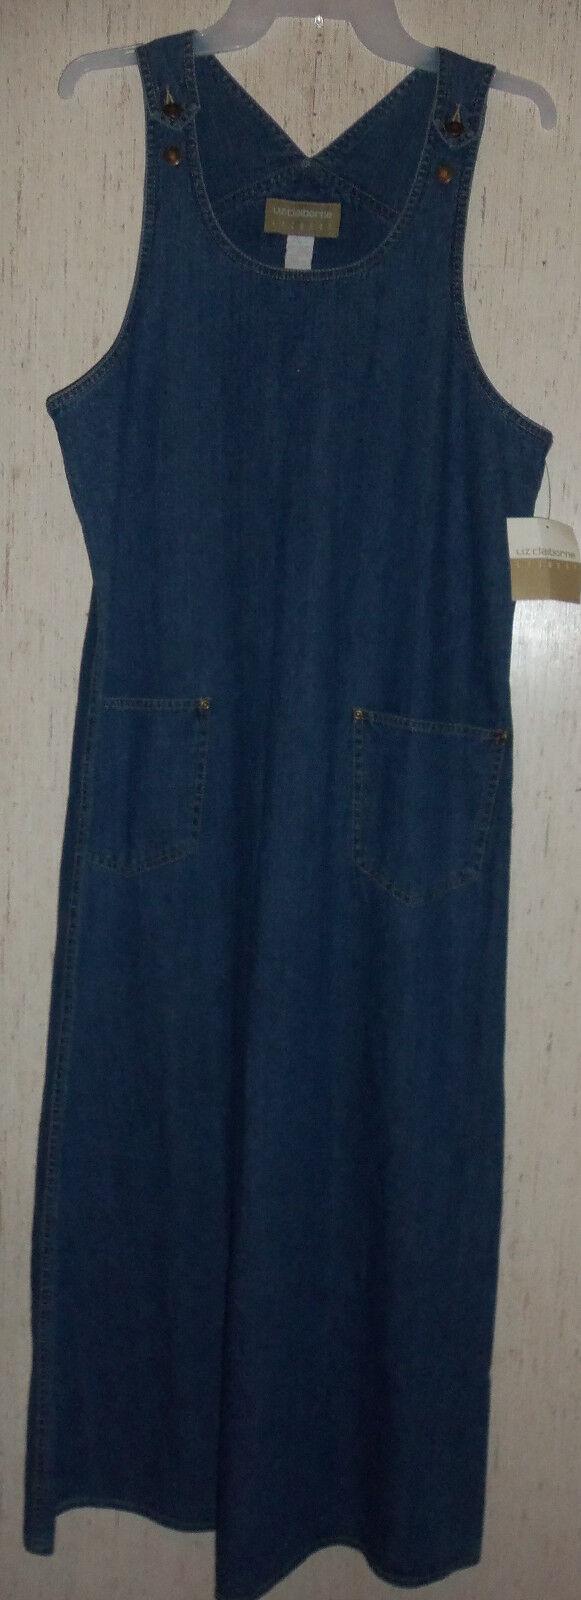 NWT WOMENS Liz Claiborne Lizwear LONG DISTRESSED blueE JEAN JUMPER DRESS  SIZE M